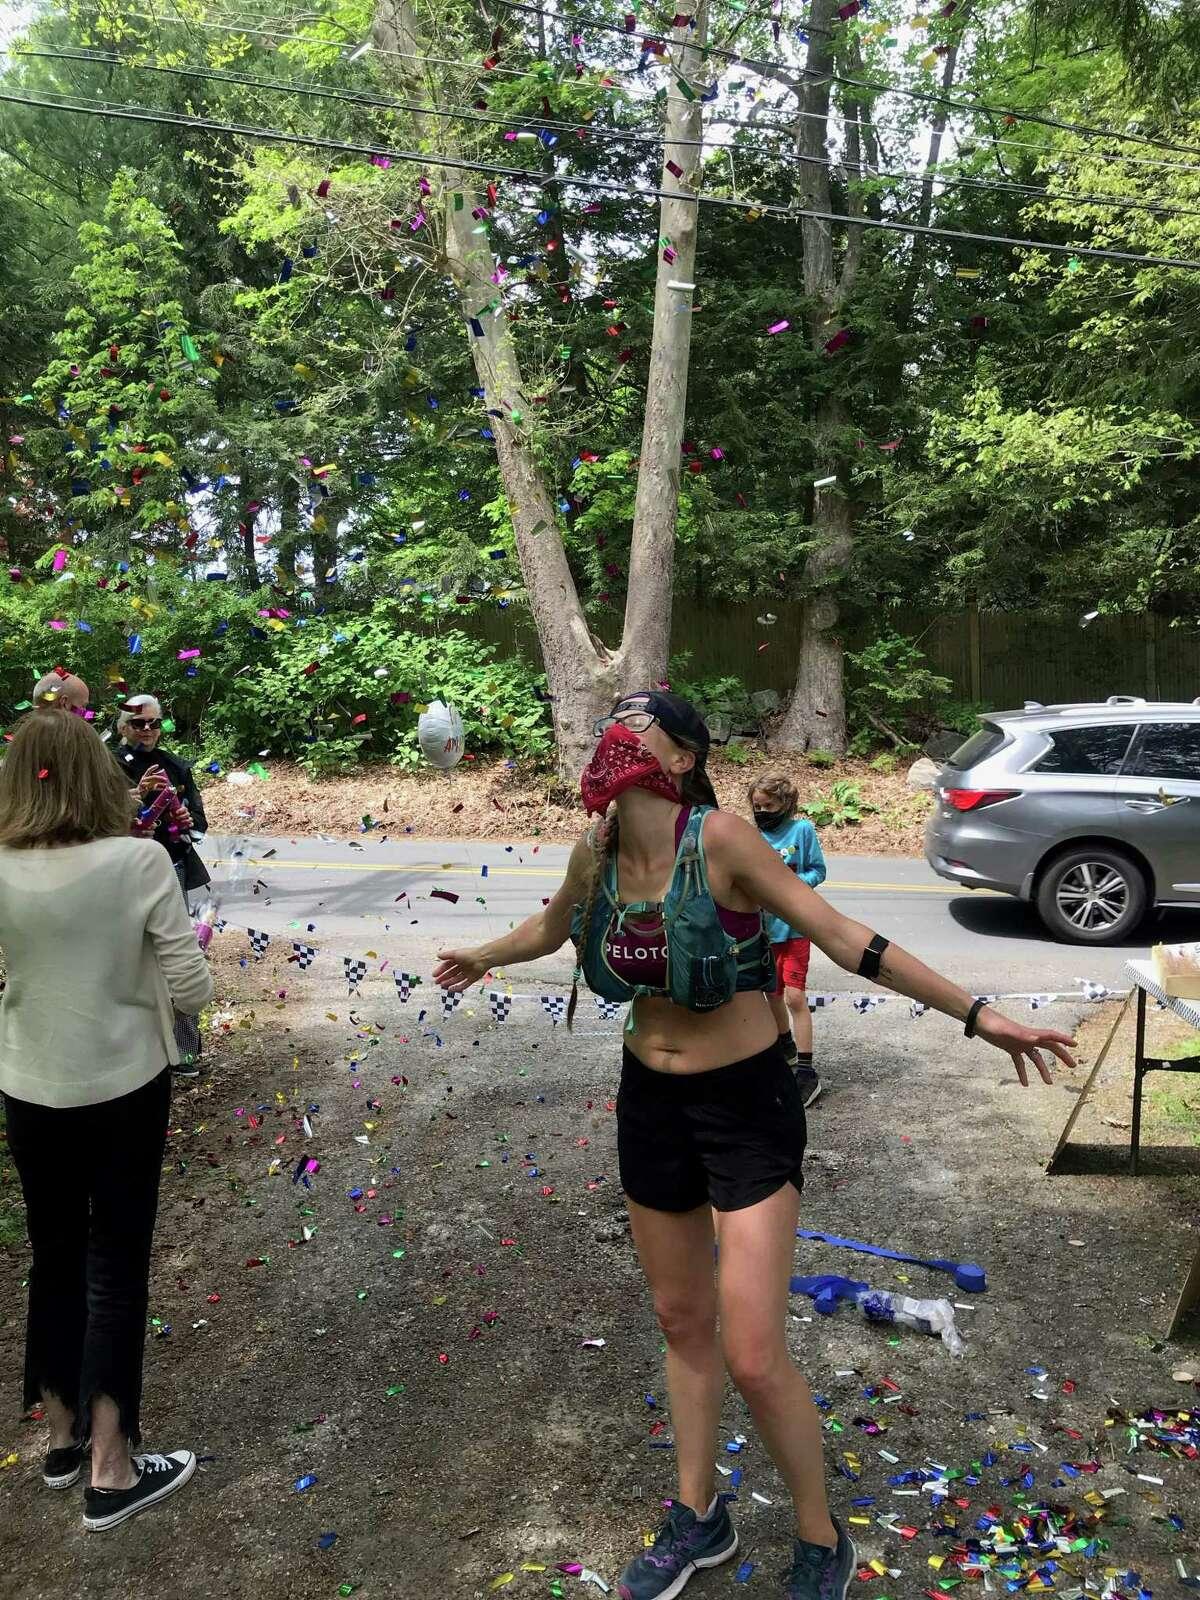 Ashley Ortelli, of Ridgefield, celebrated her 35th birthday by running a 35-mile ultramarathon on May 16.